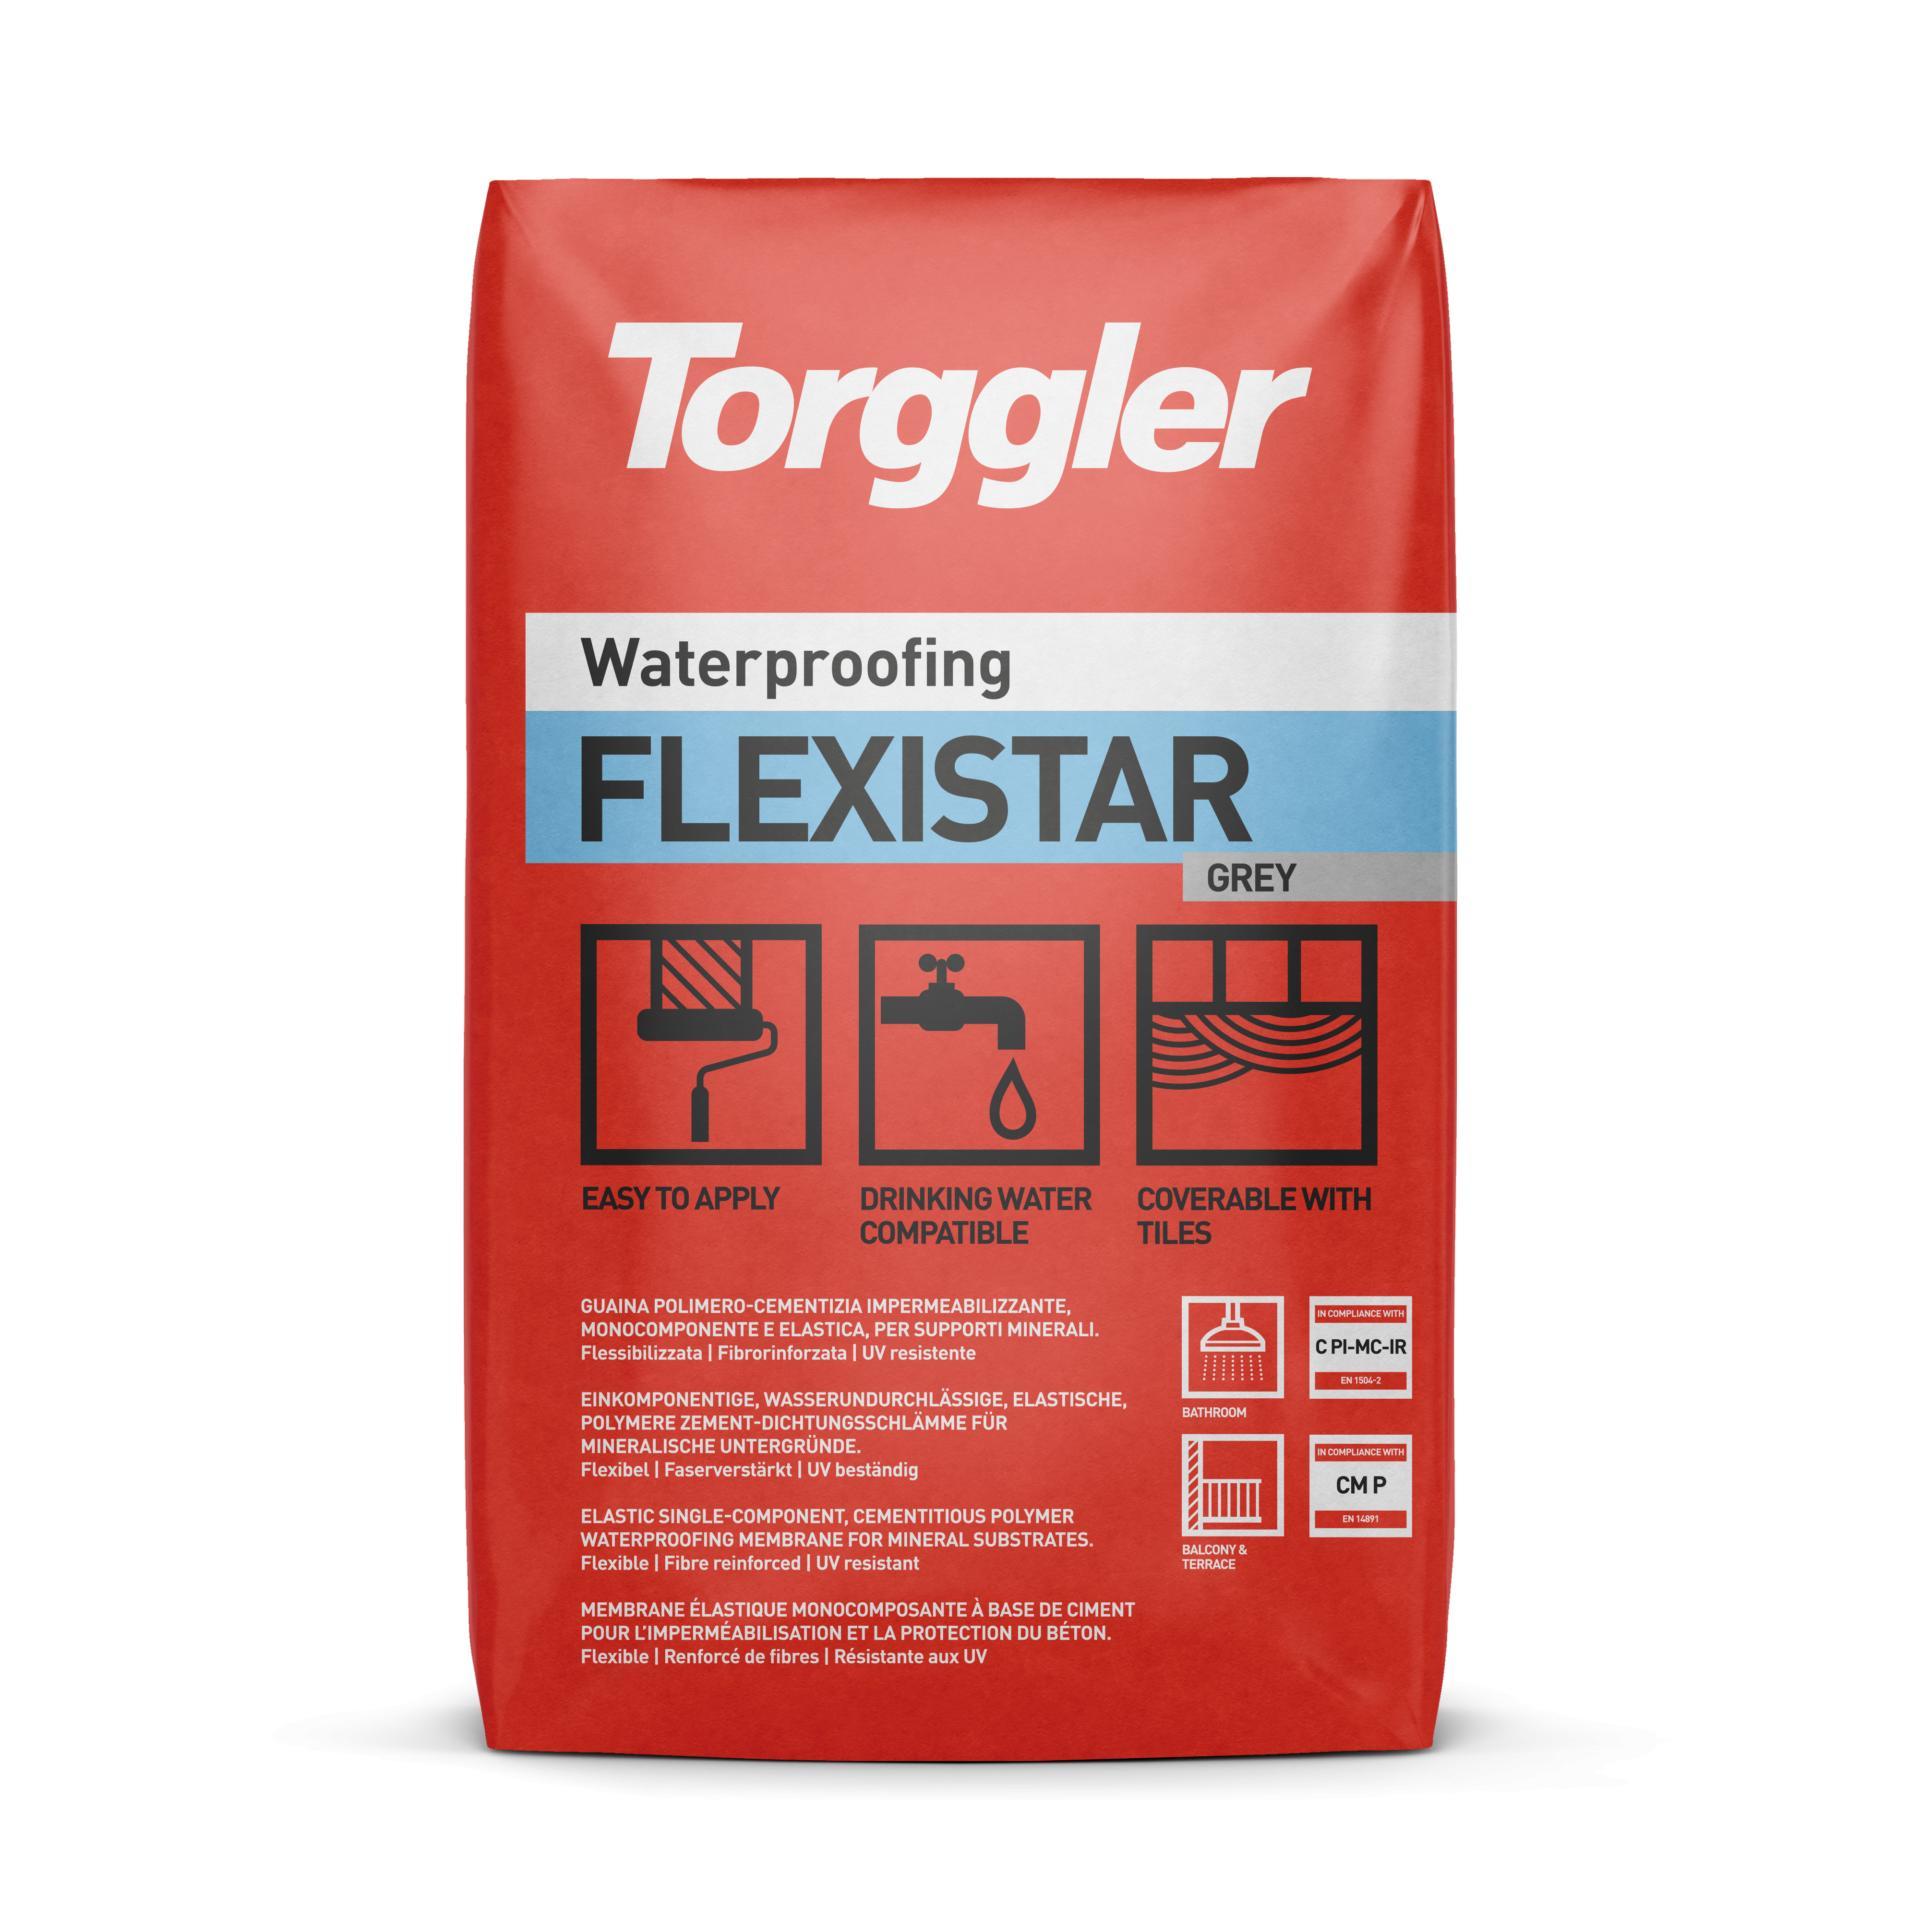 Flexistar TORGGLER Image